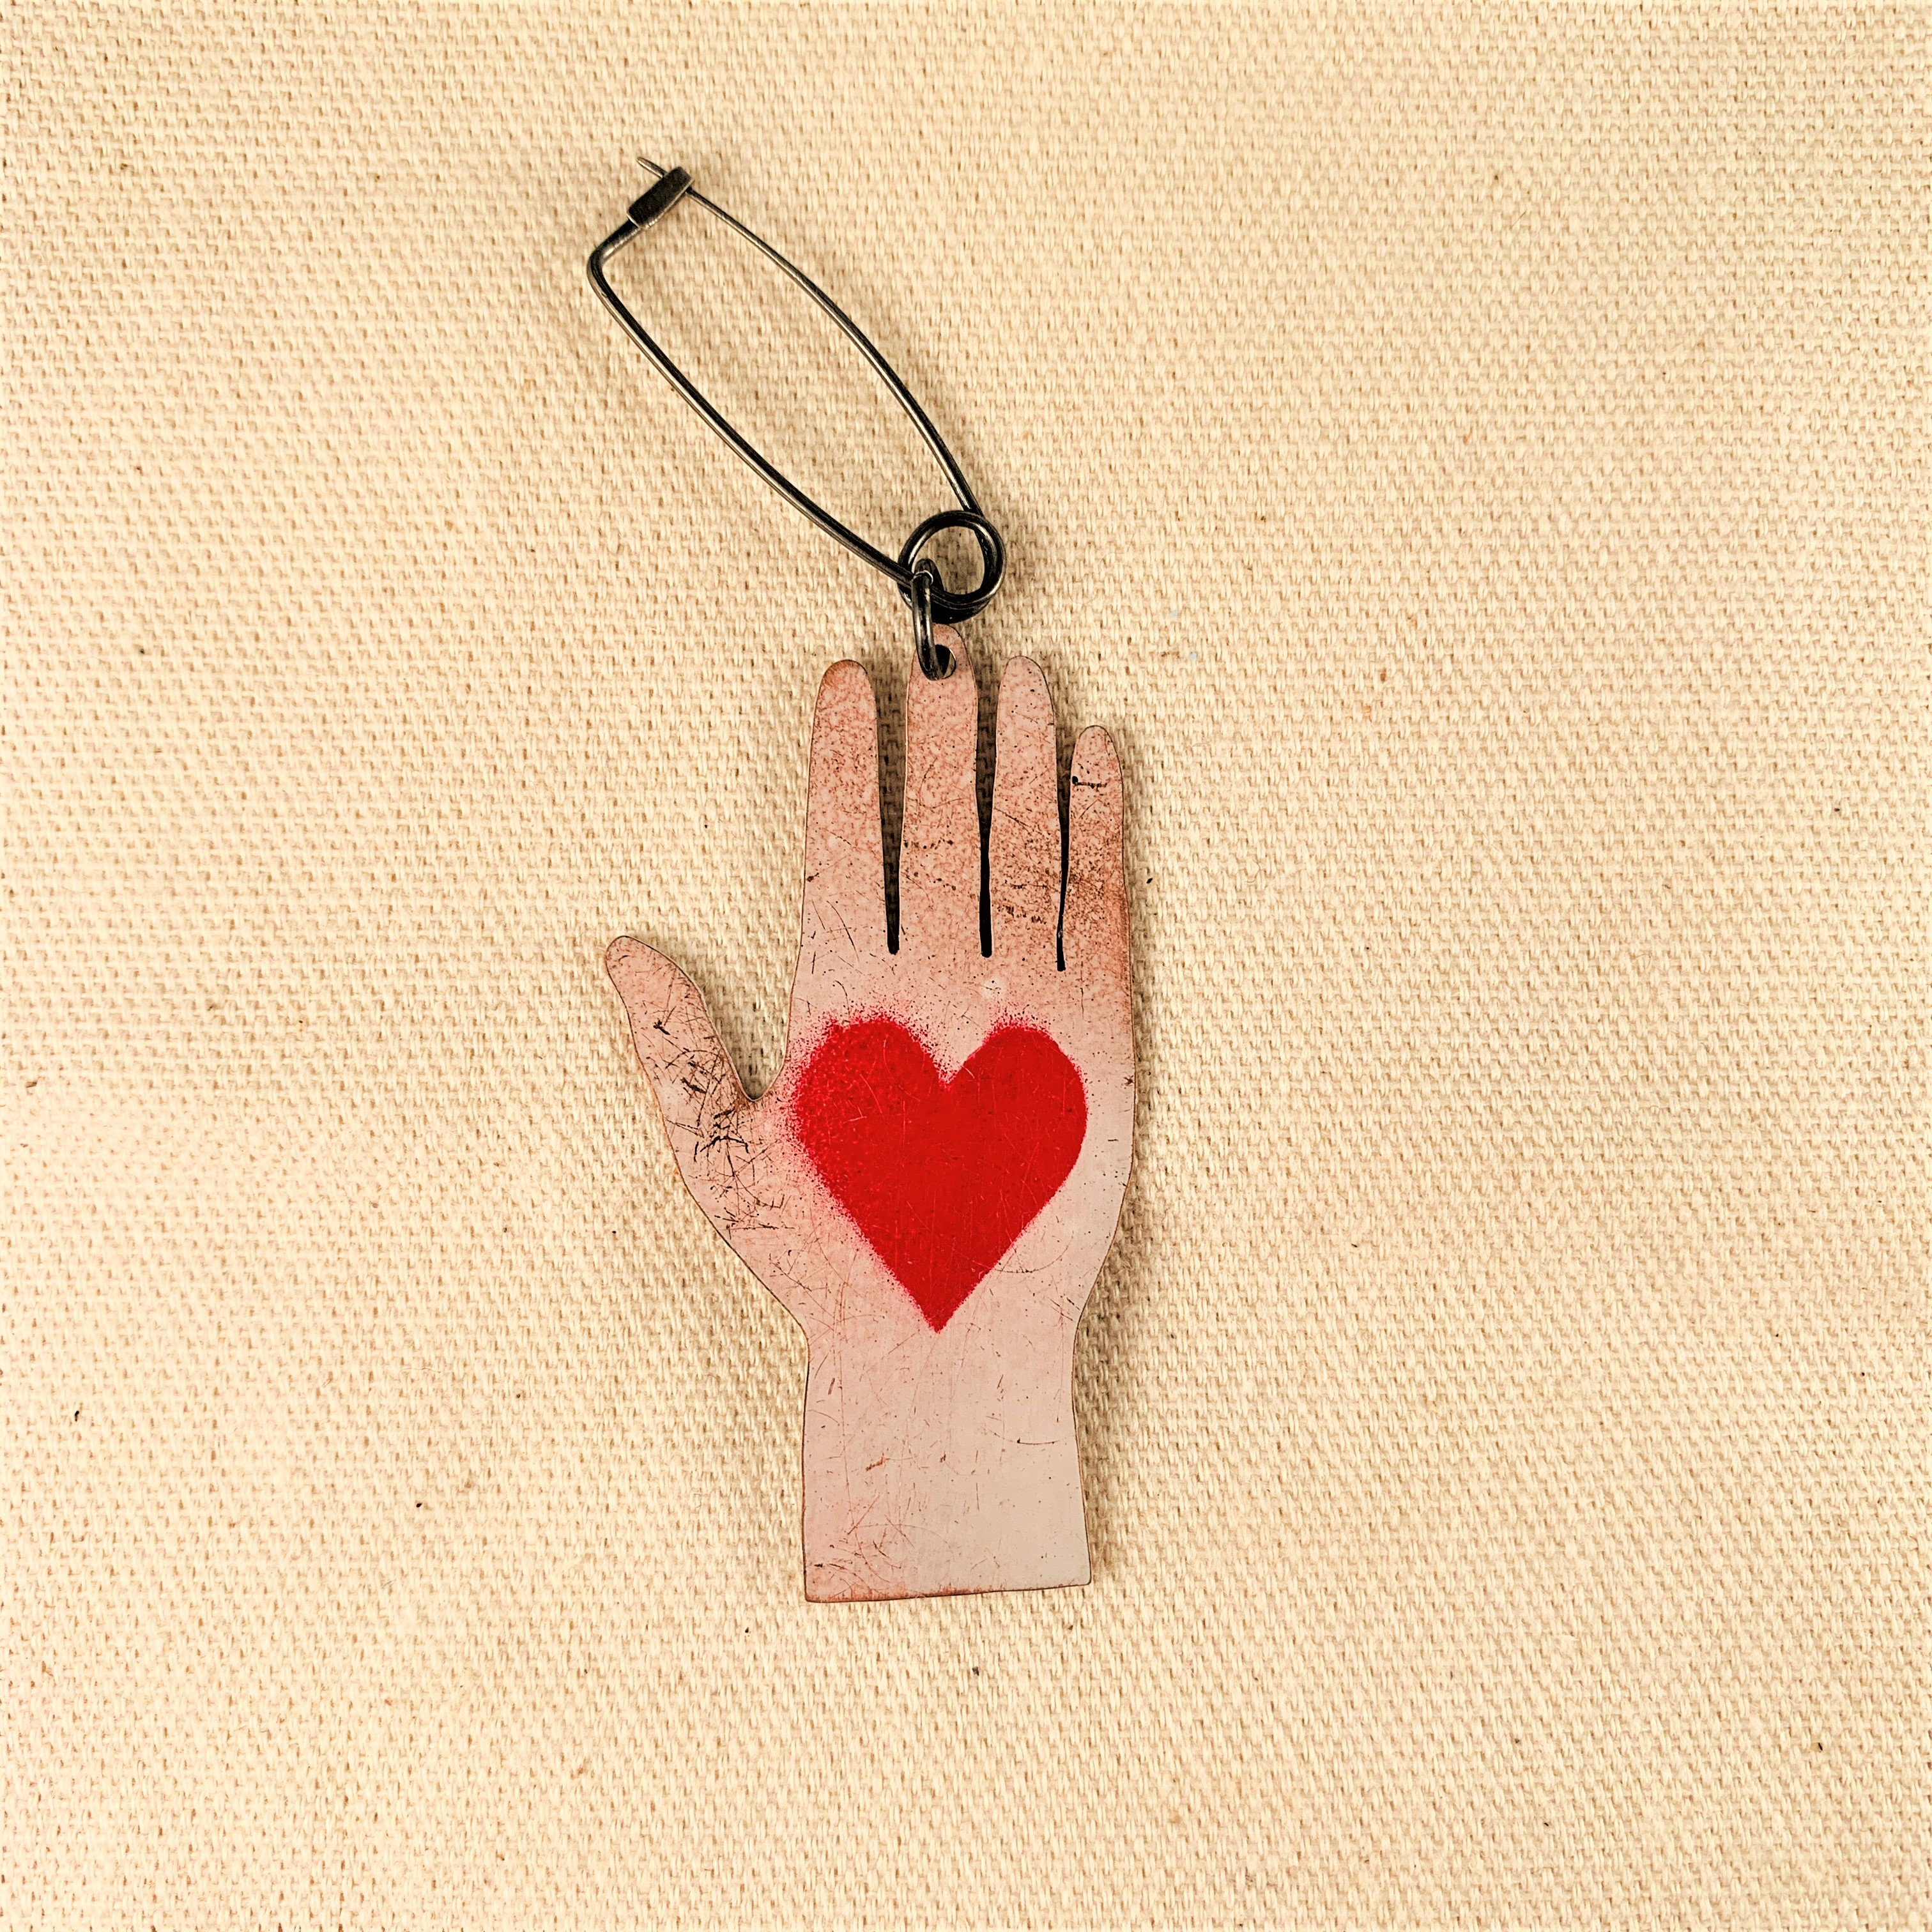 Anna Watson - Heart Hand Brooch